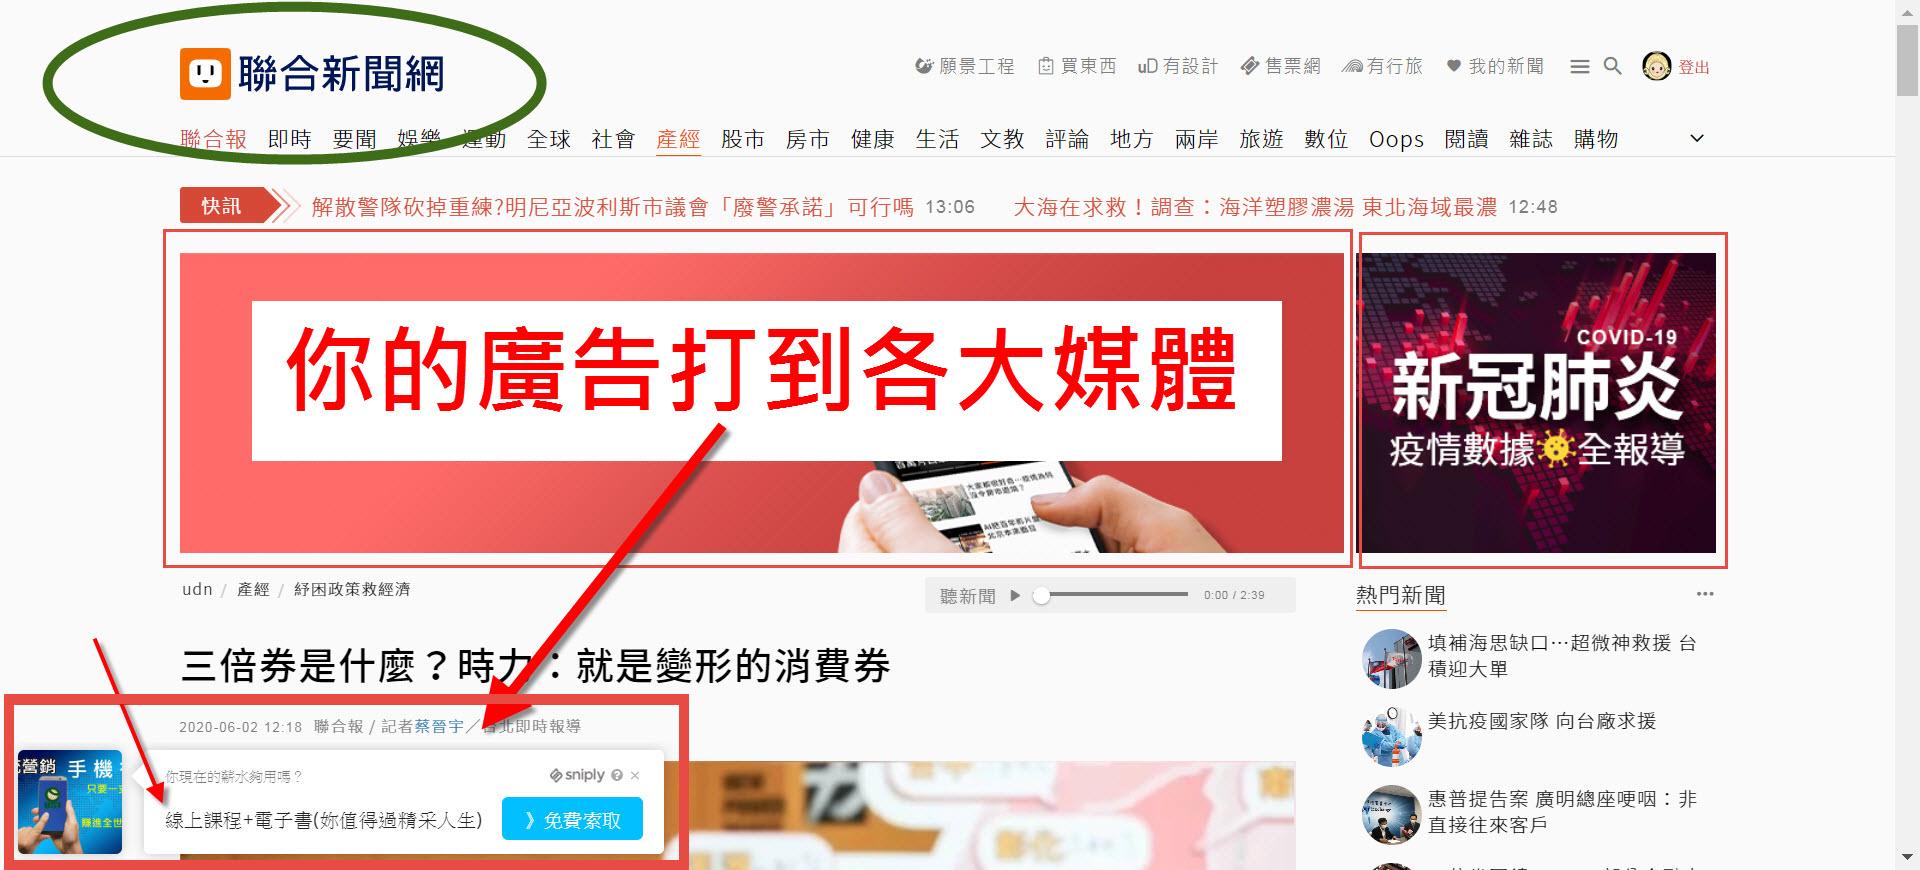 11 廣告框012 UDN聯合新聞網 2020-06-07_19-45-04